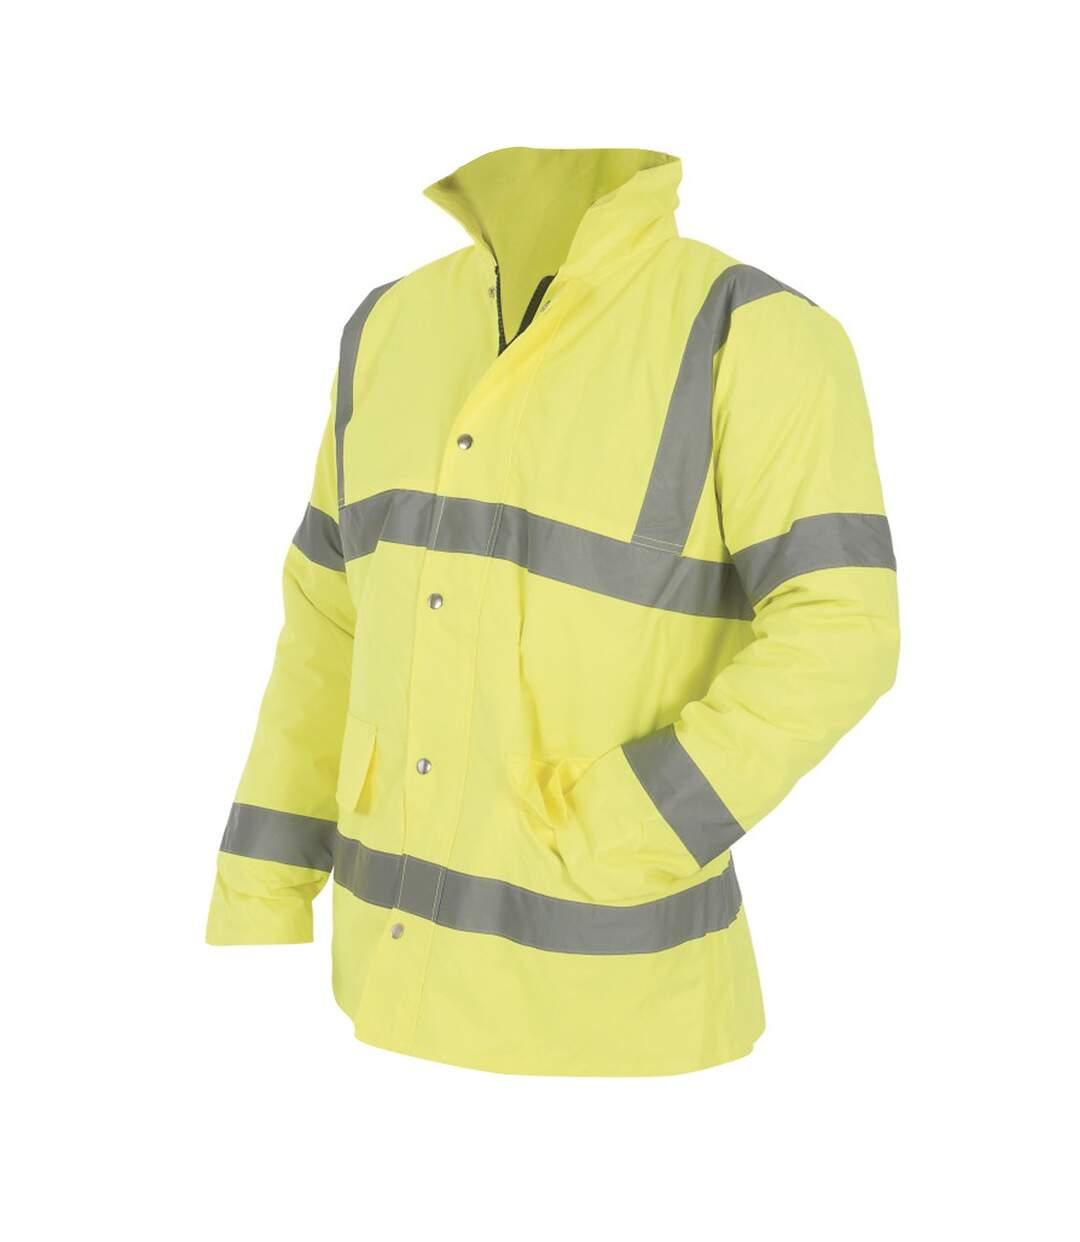 Yoko Mens Hi-Vis Road Safety Jacket (Pack of 2) (Hi-Vis Yellow) - UTBC4399